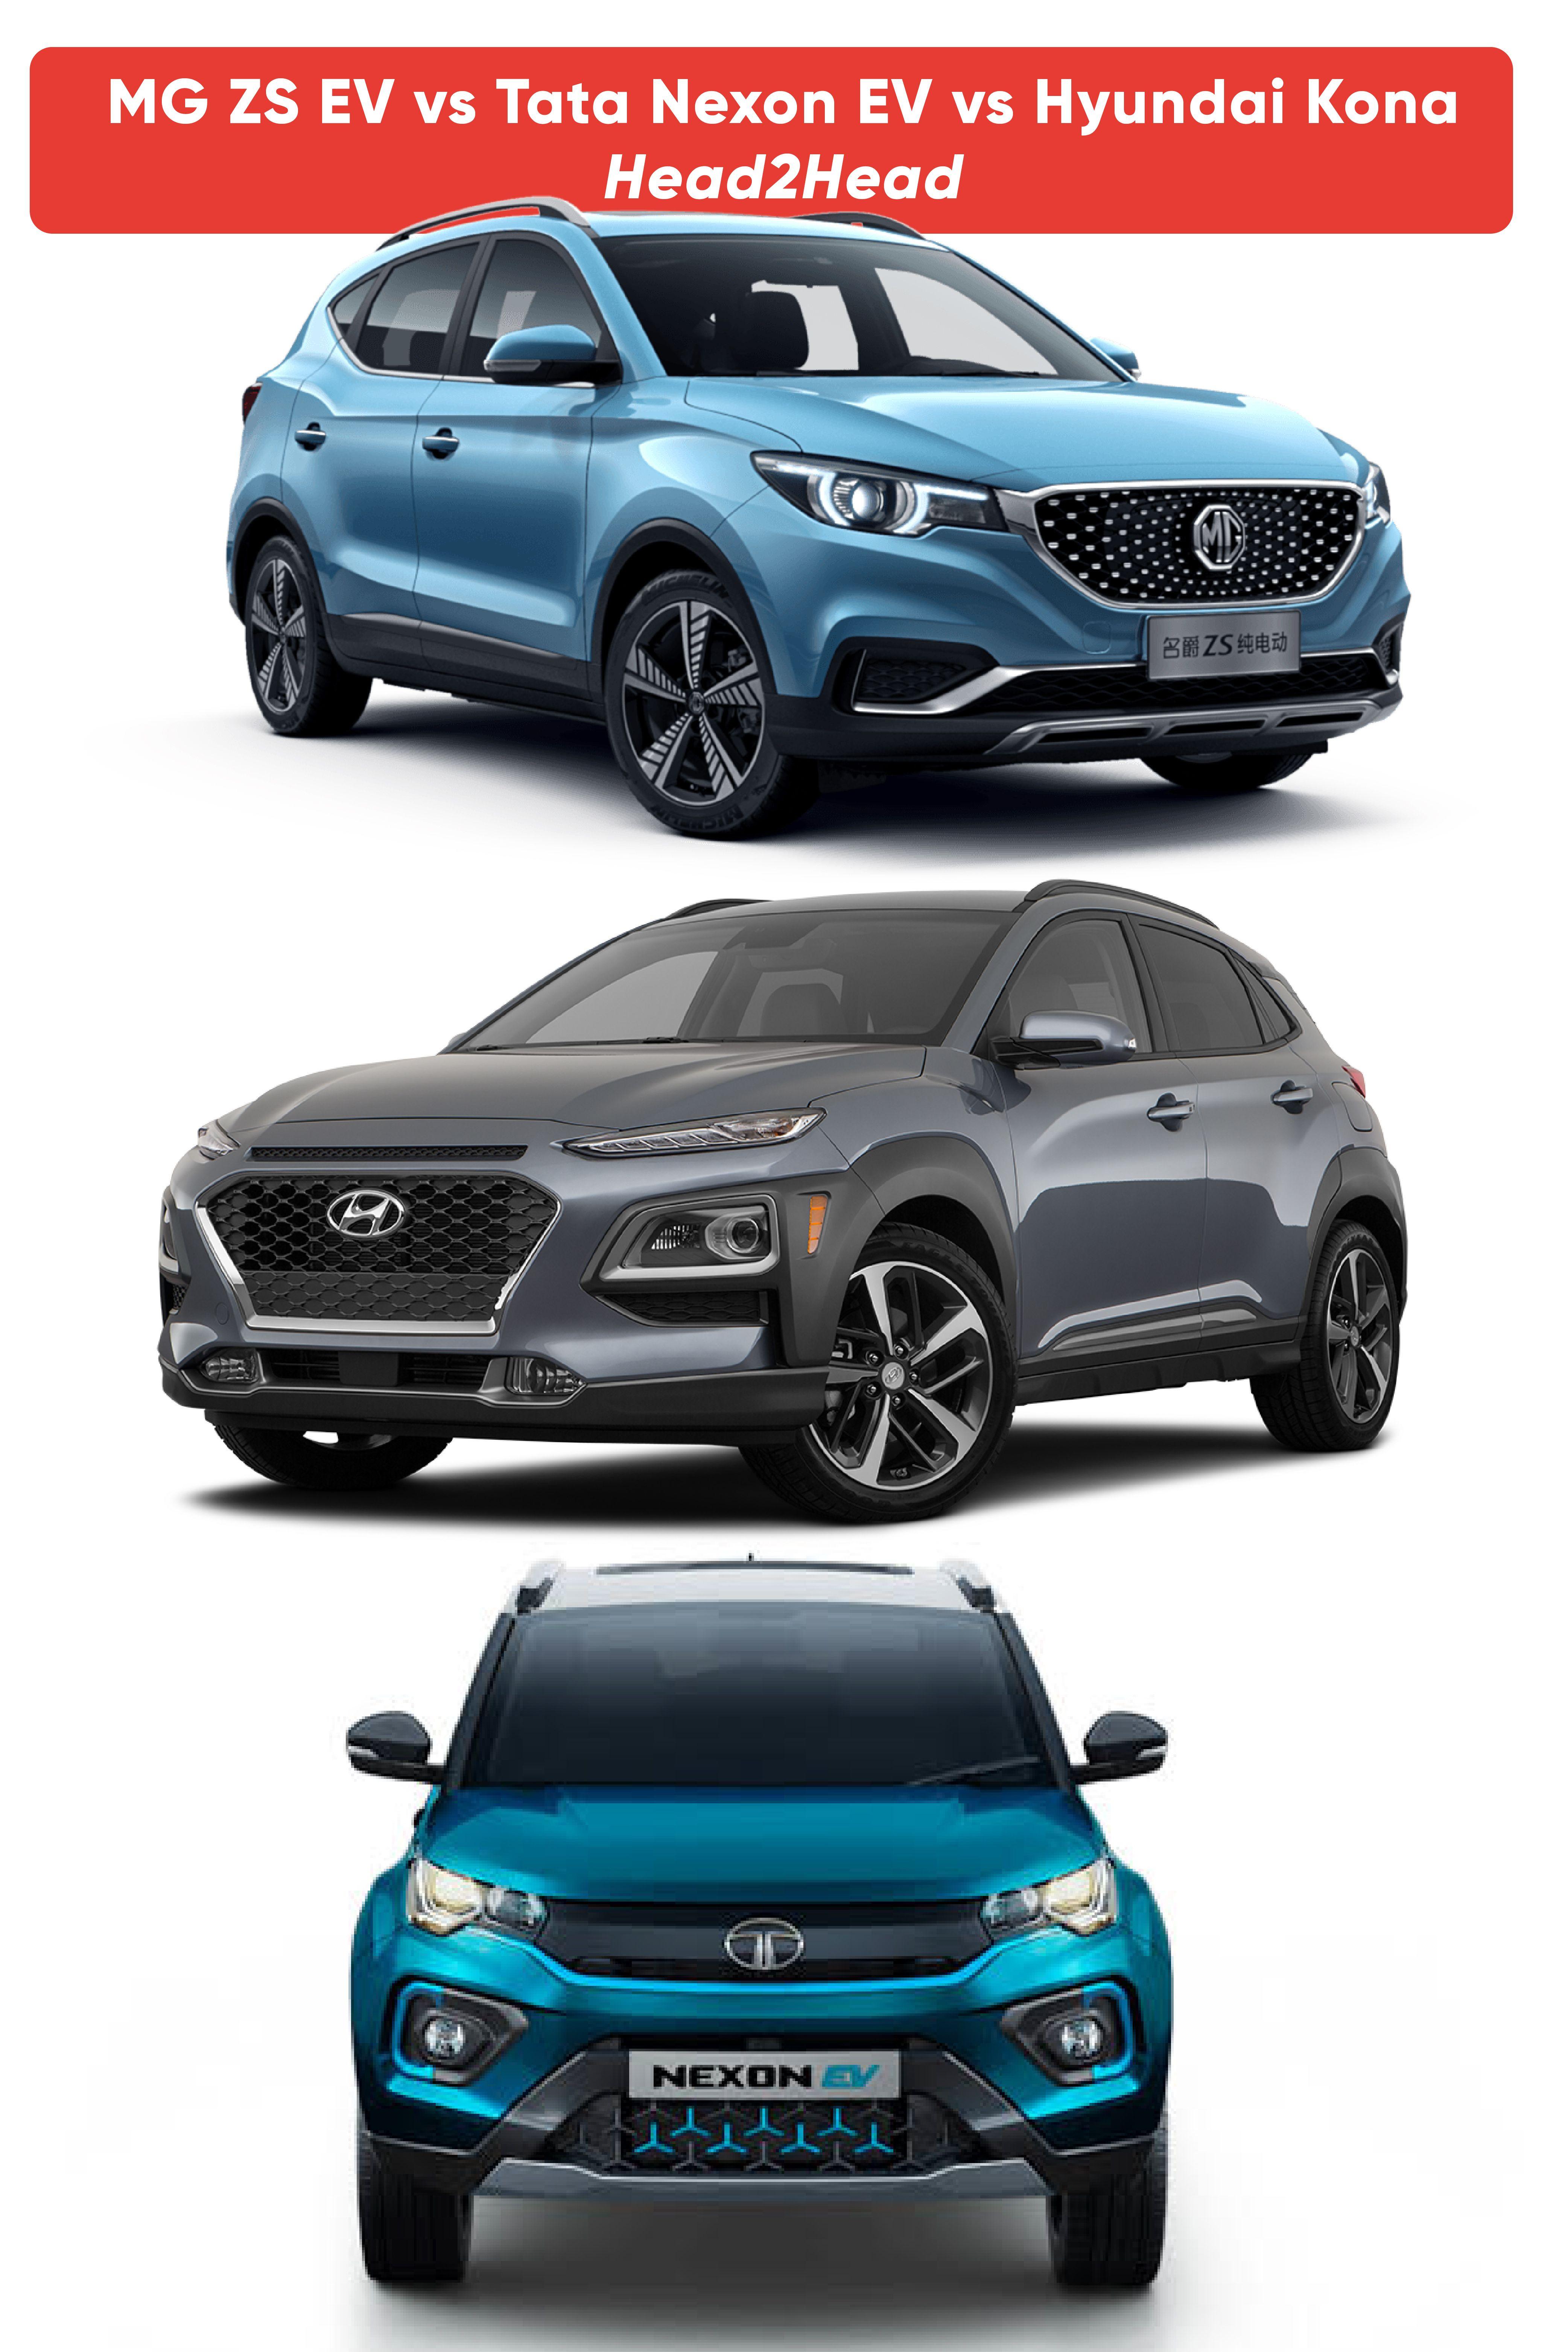 MG ZS EV vs Tata Nexon EV vs Hyundai Kona Head2Head